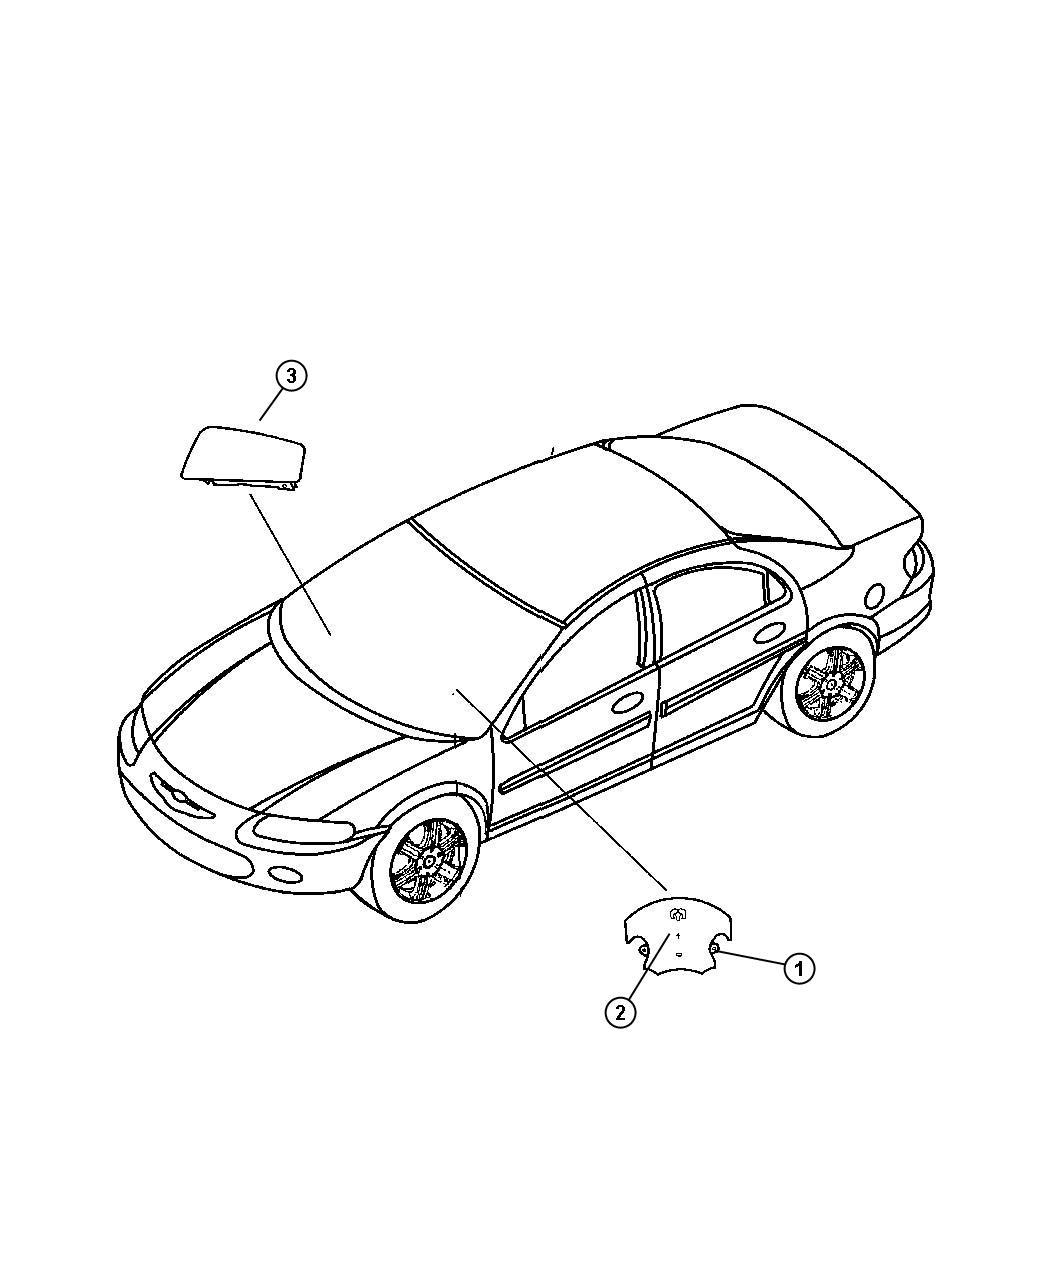 2008 Dodge Avenger Air bag. Driver. Trim: [all trim codes